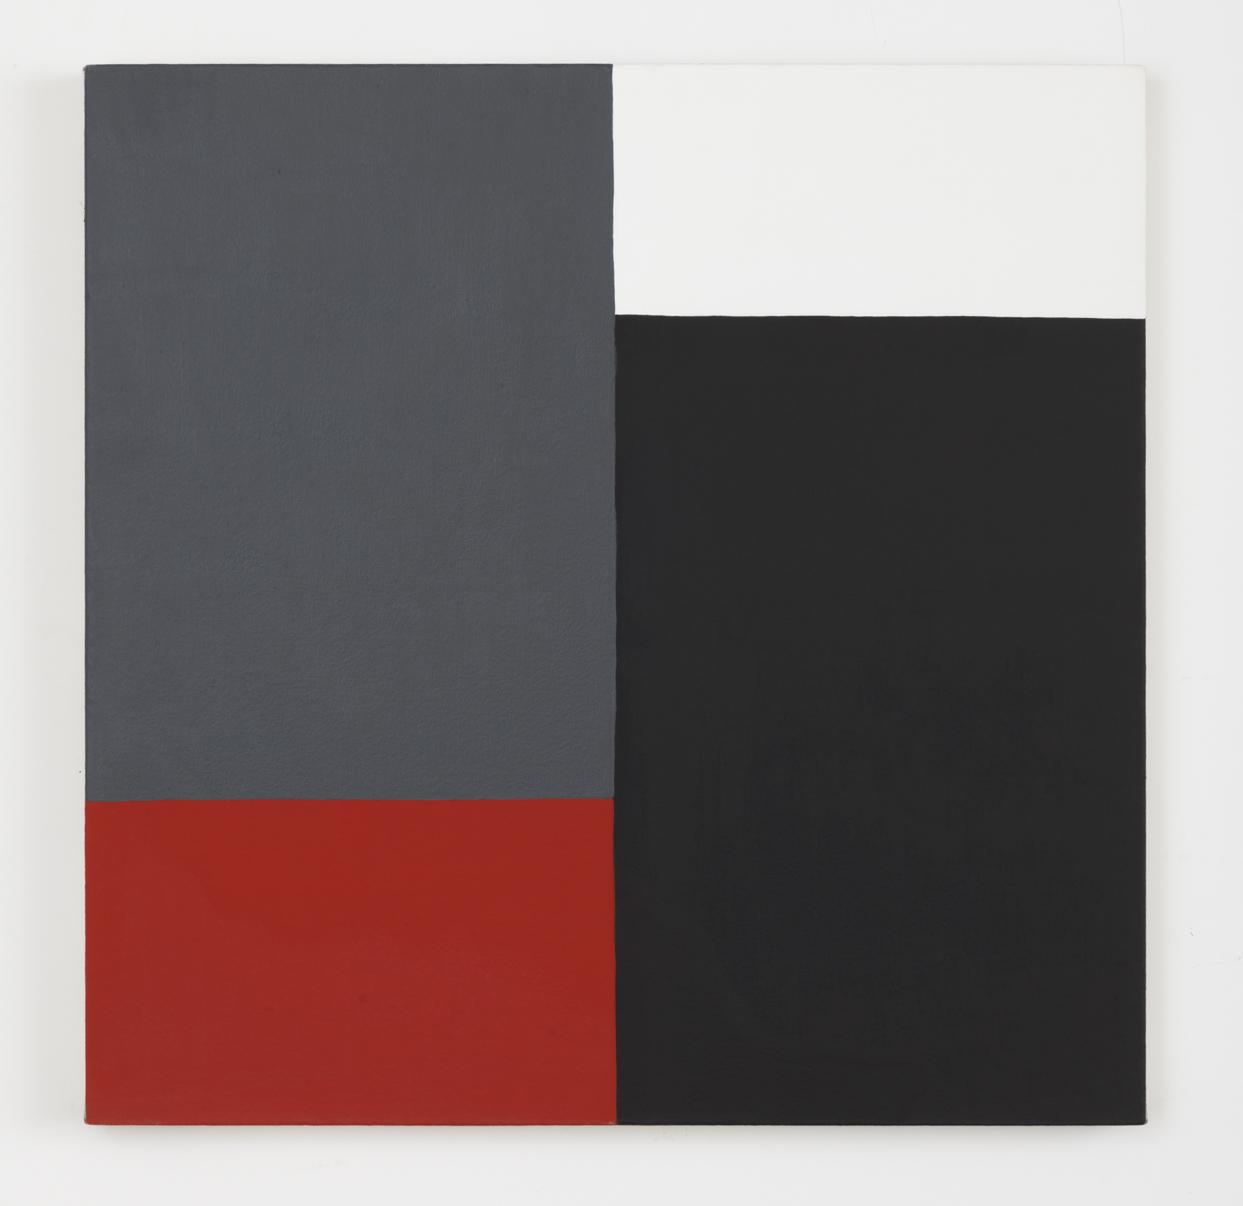 Edith Baumann  Untitled #4,  1977 acrylic on canvas 26 - 1/4 x 26 - 1/4 inches